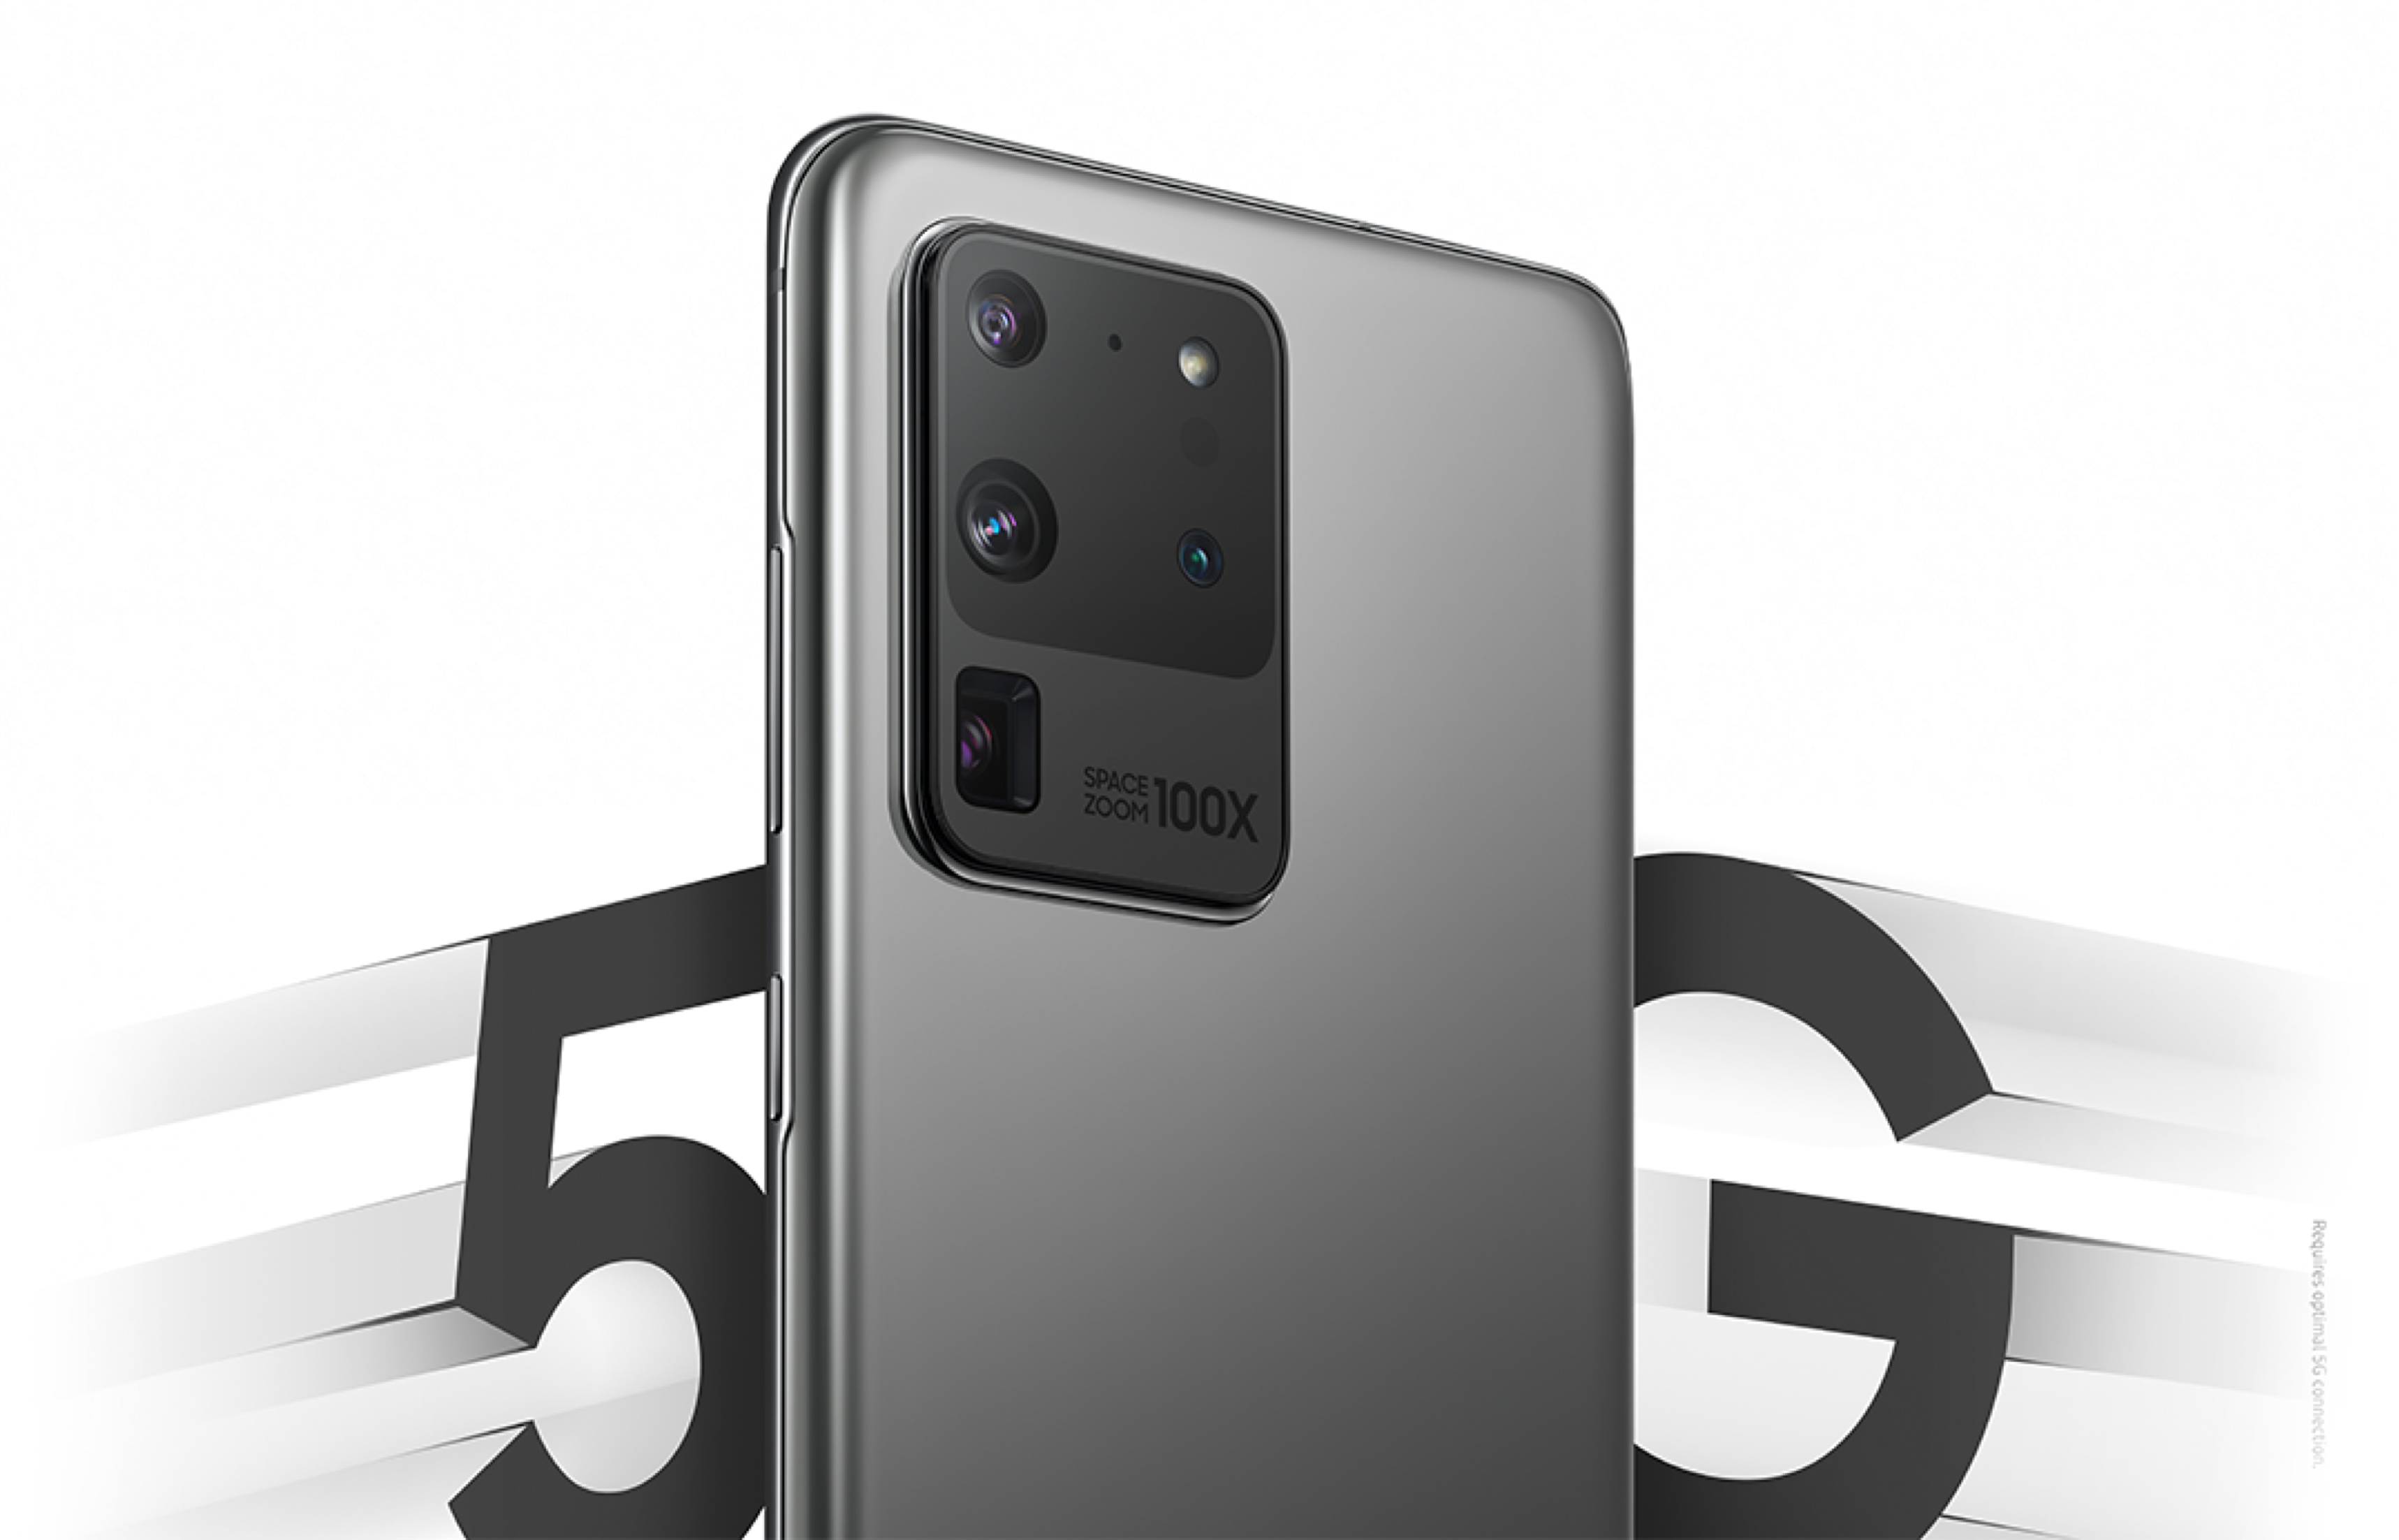 The Samsung Galaxy S20 5G phone